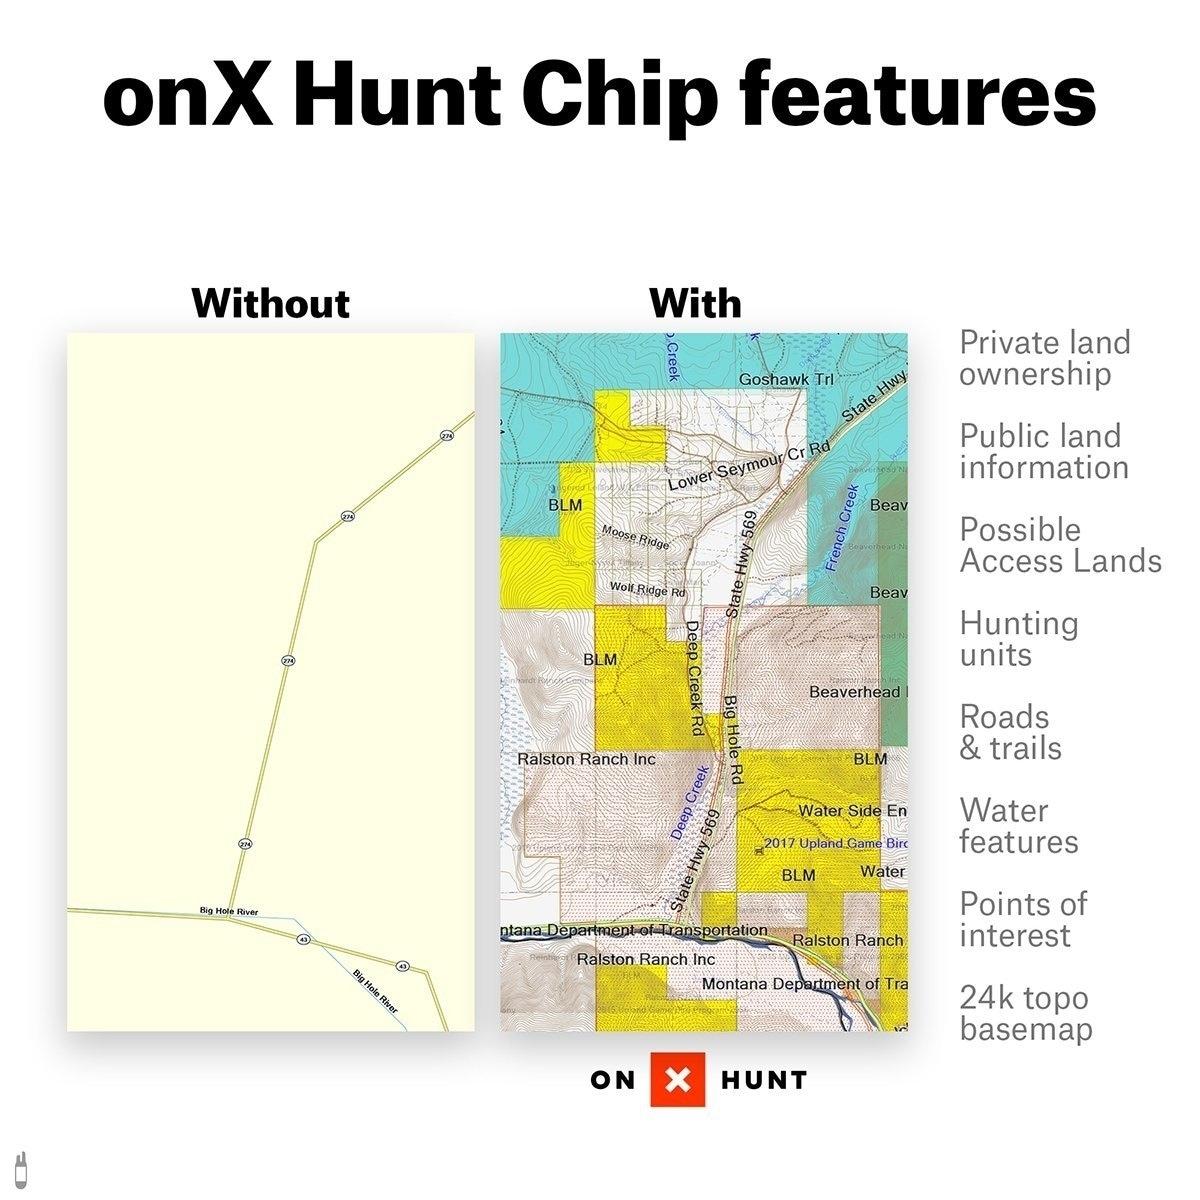 Deep Creek Florida Map.Shop Onx Hunt Florida Public Private Land Ownership 24k Topo Maps